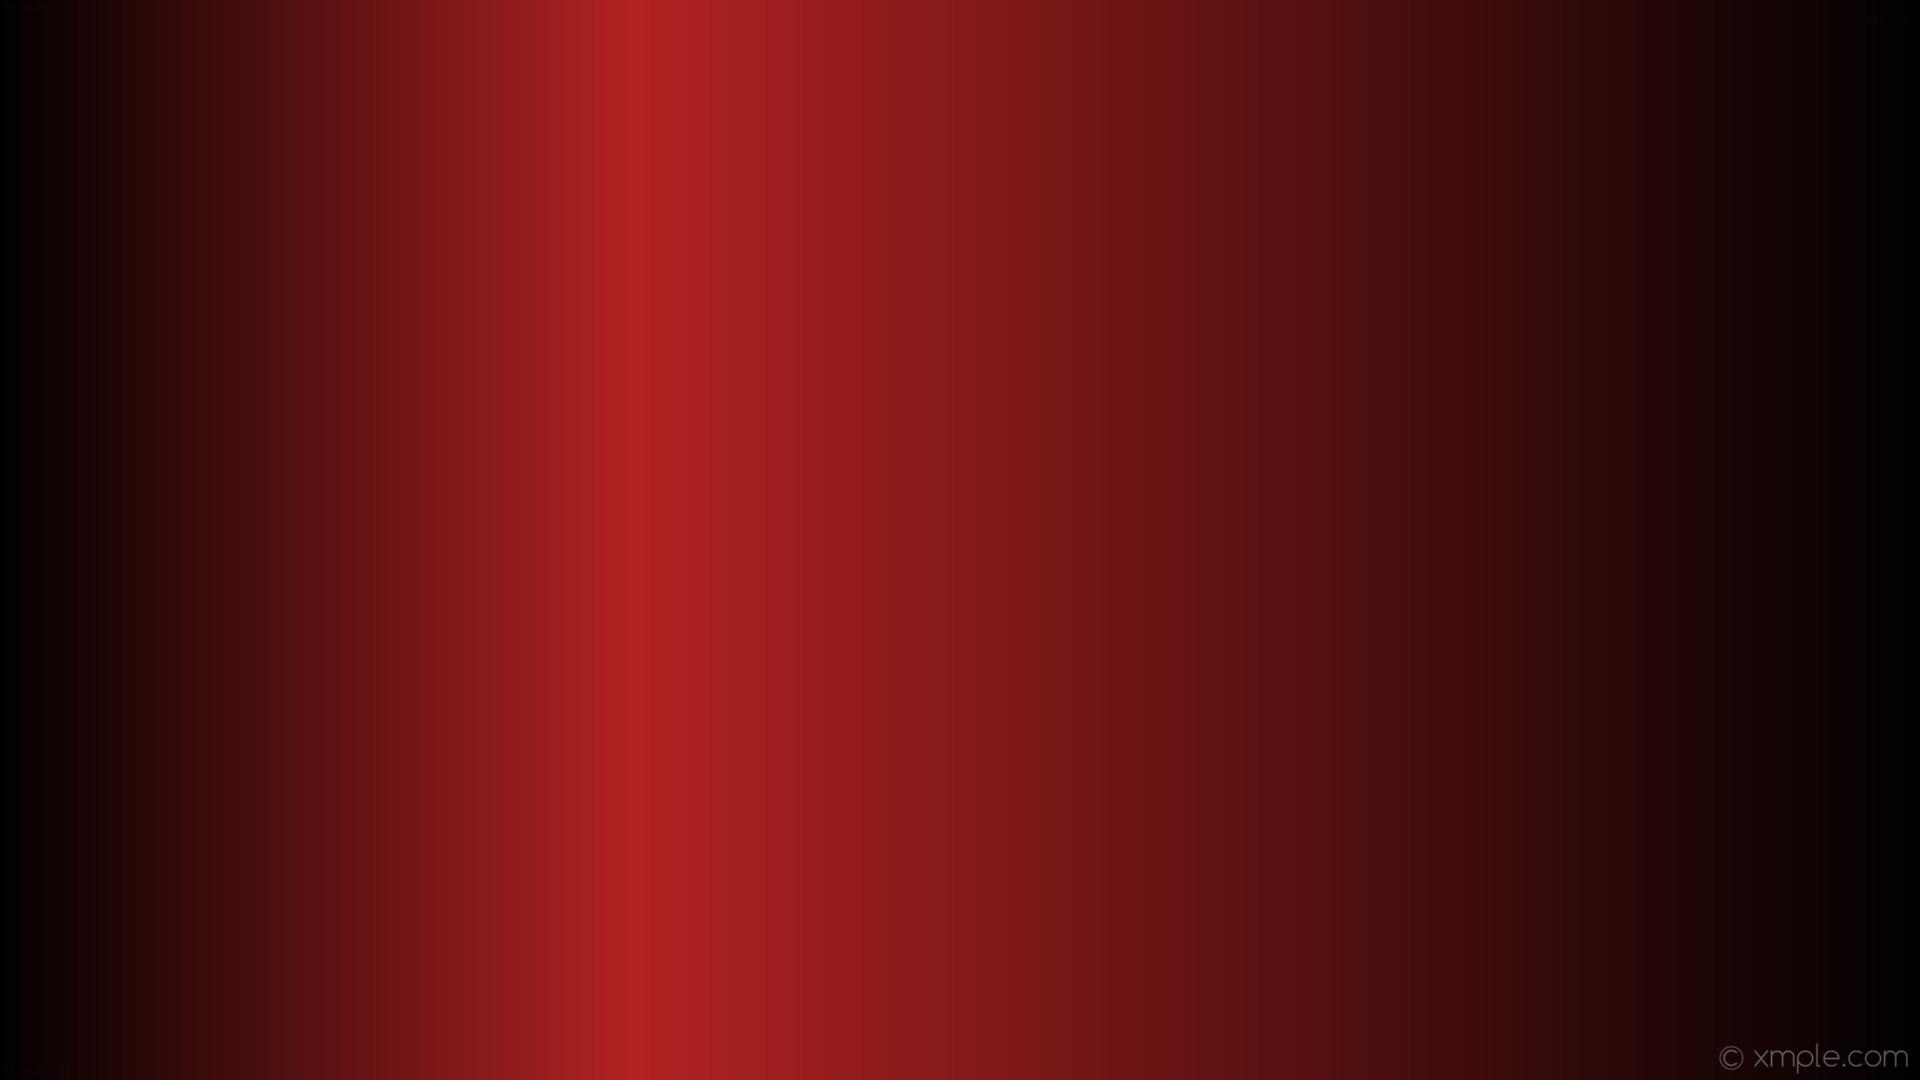 wallpaper linear highlight black gradient red fire brick #000000 #b22222  180° 33%